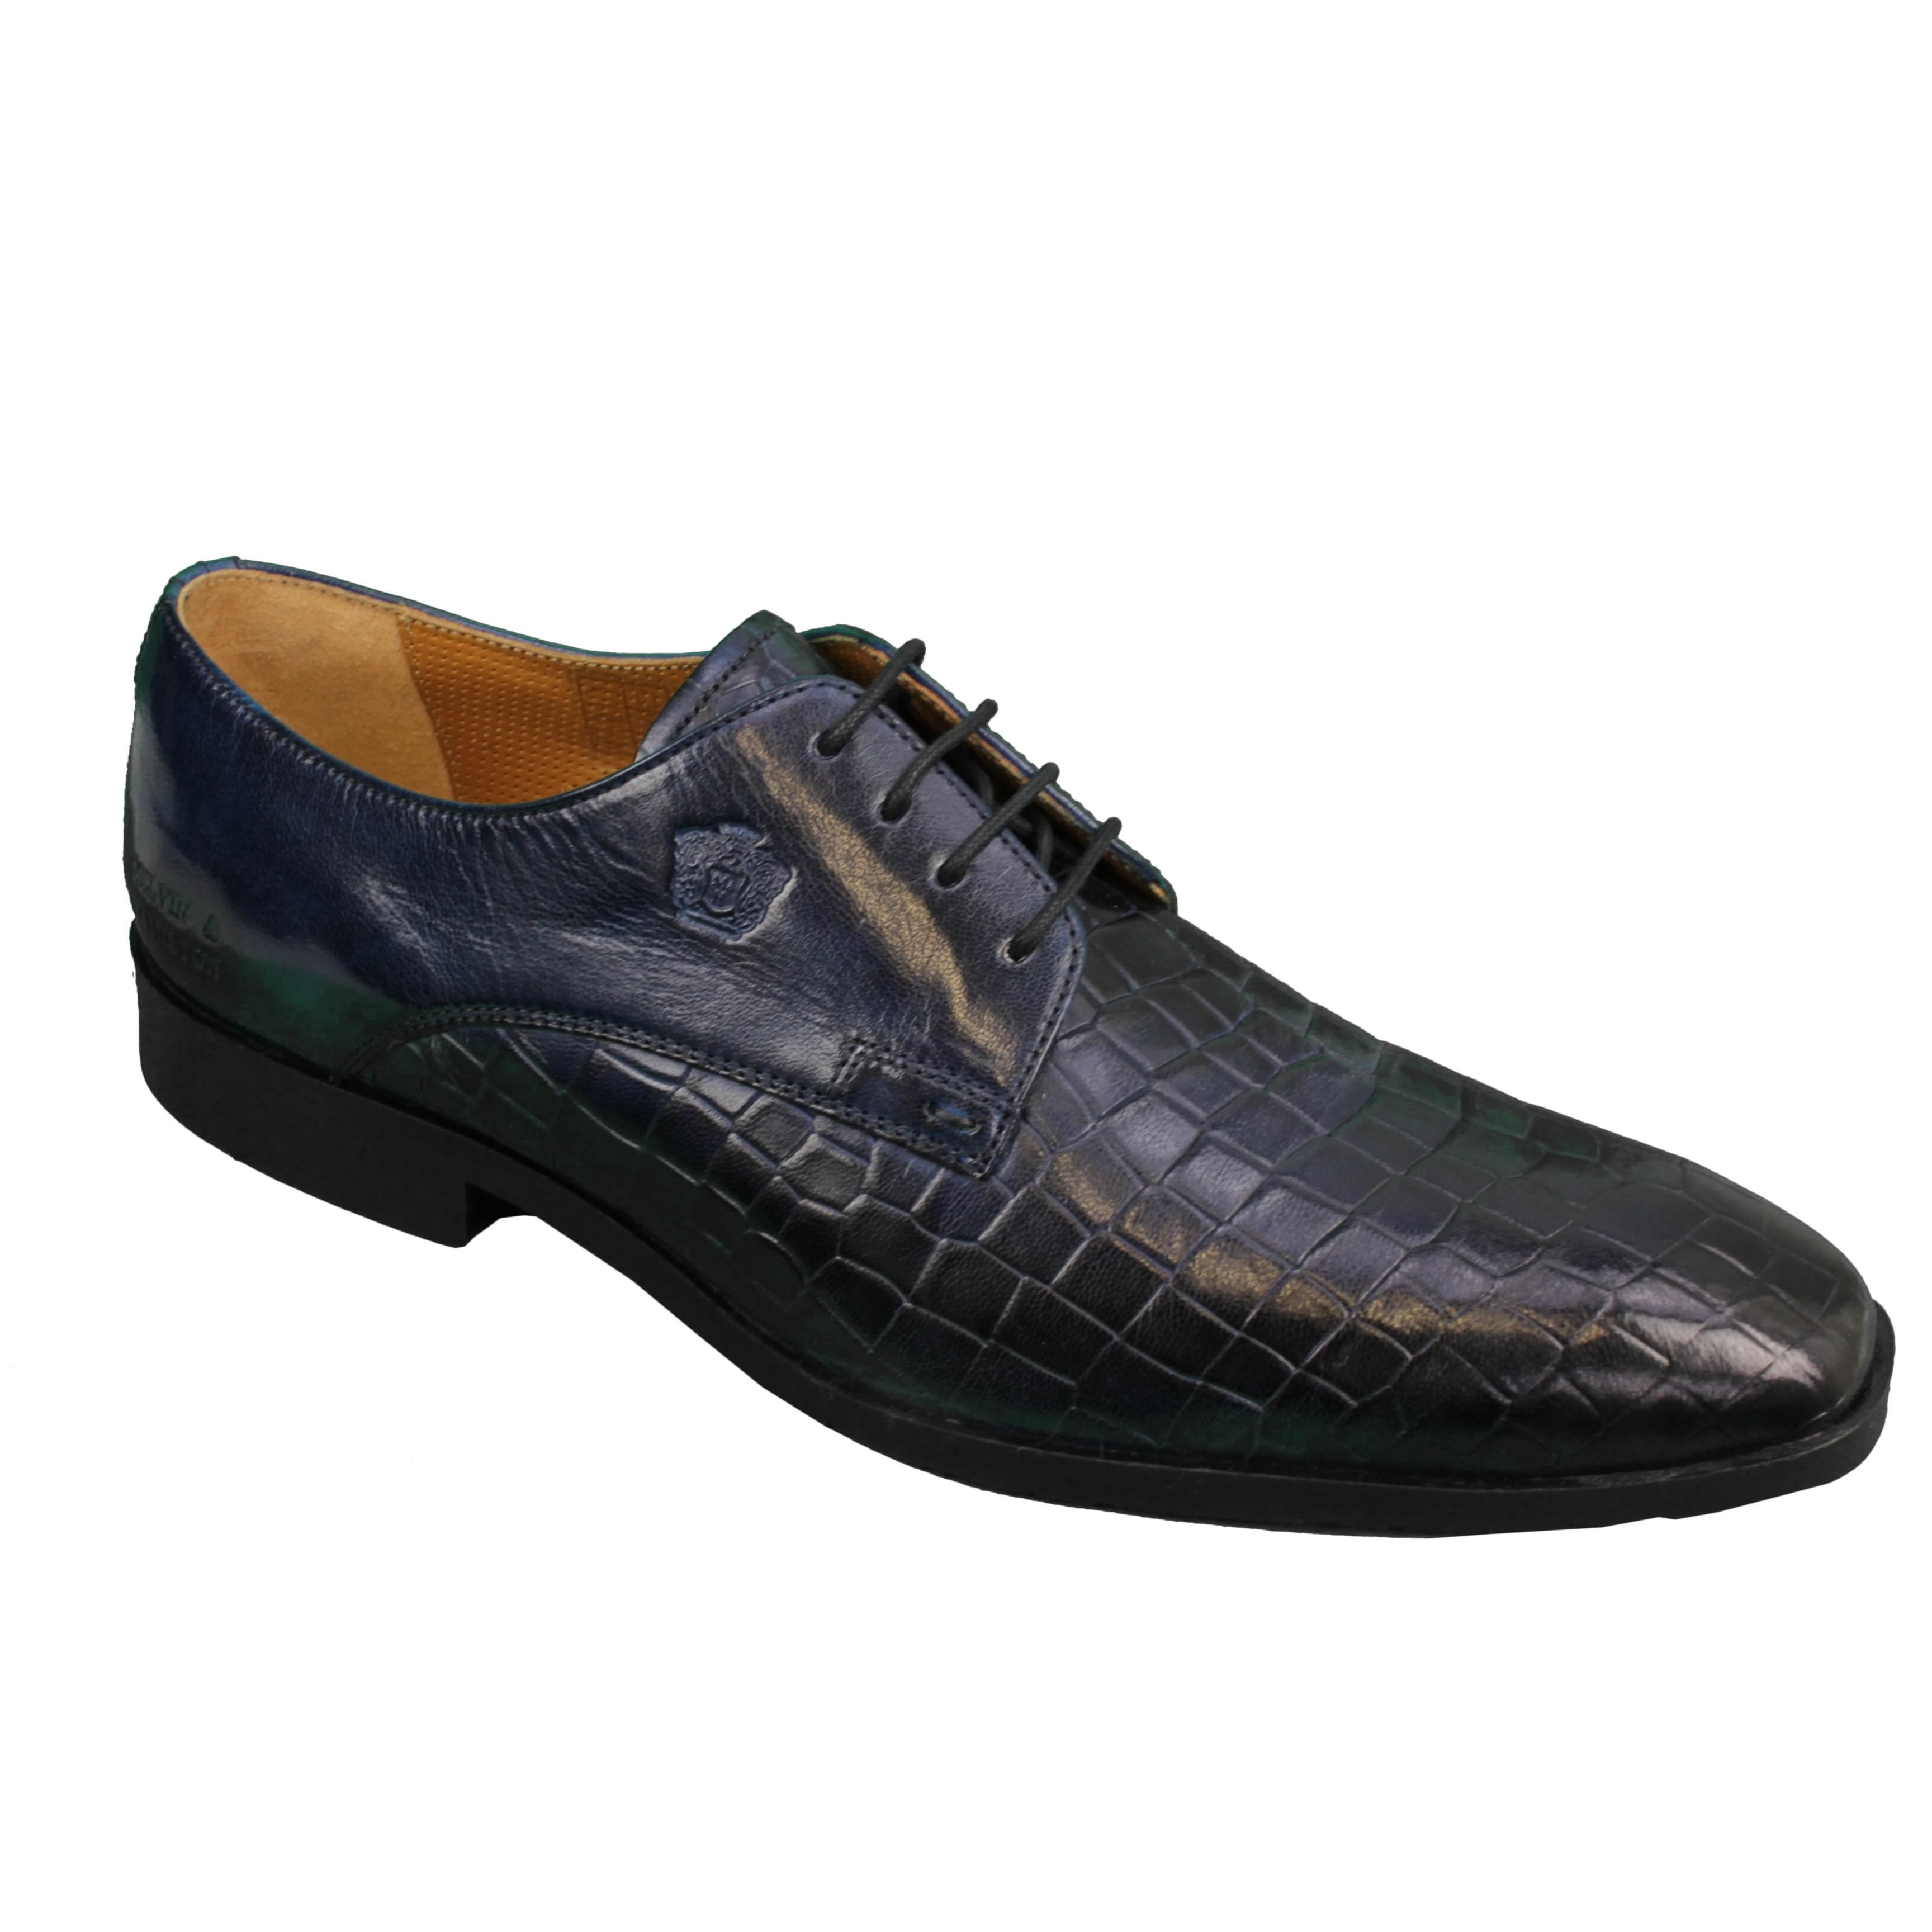 Melvin & Hamilton Schuhe marine blau Greg-4 110807 navy